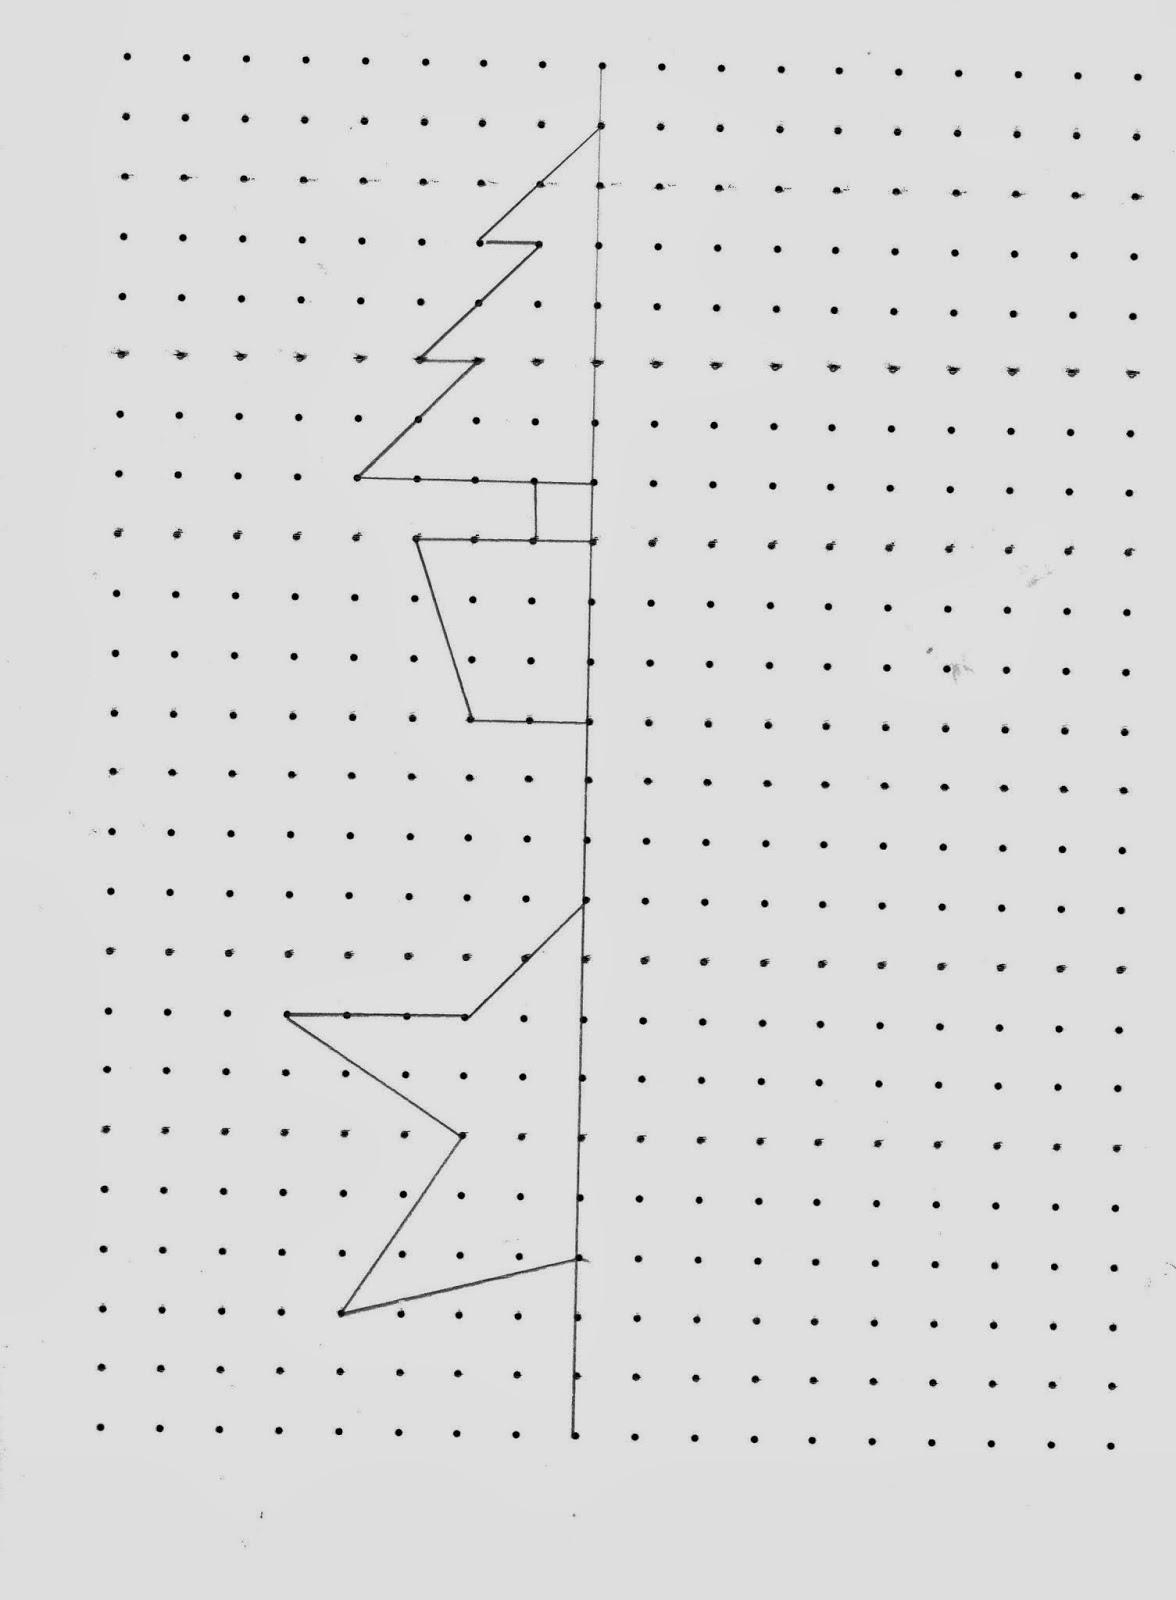 Christmas Symmetry Maths